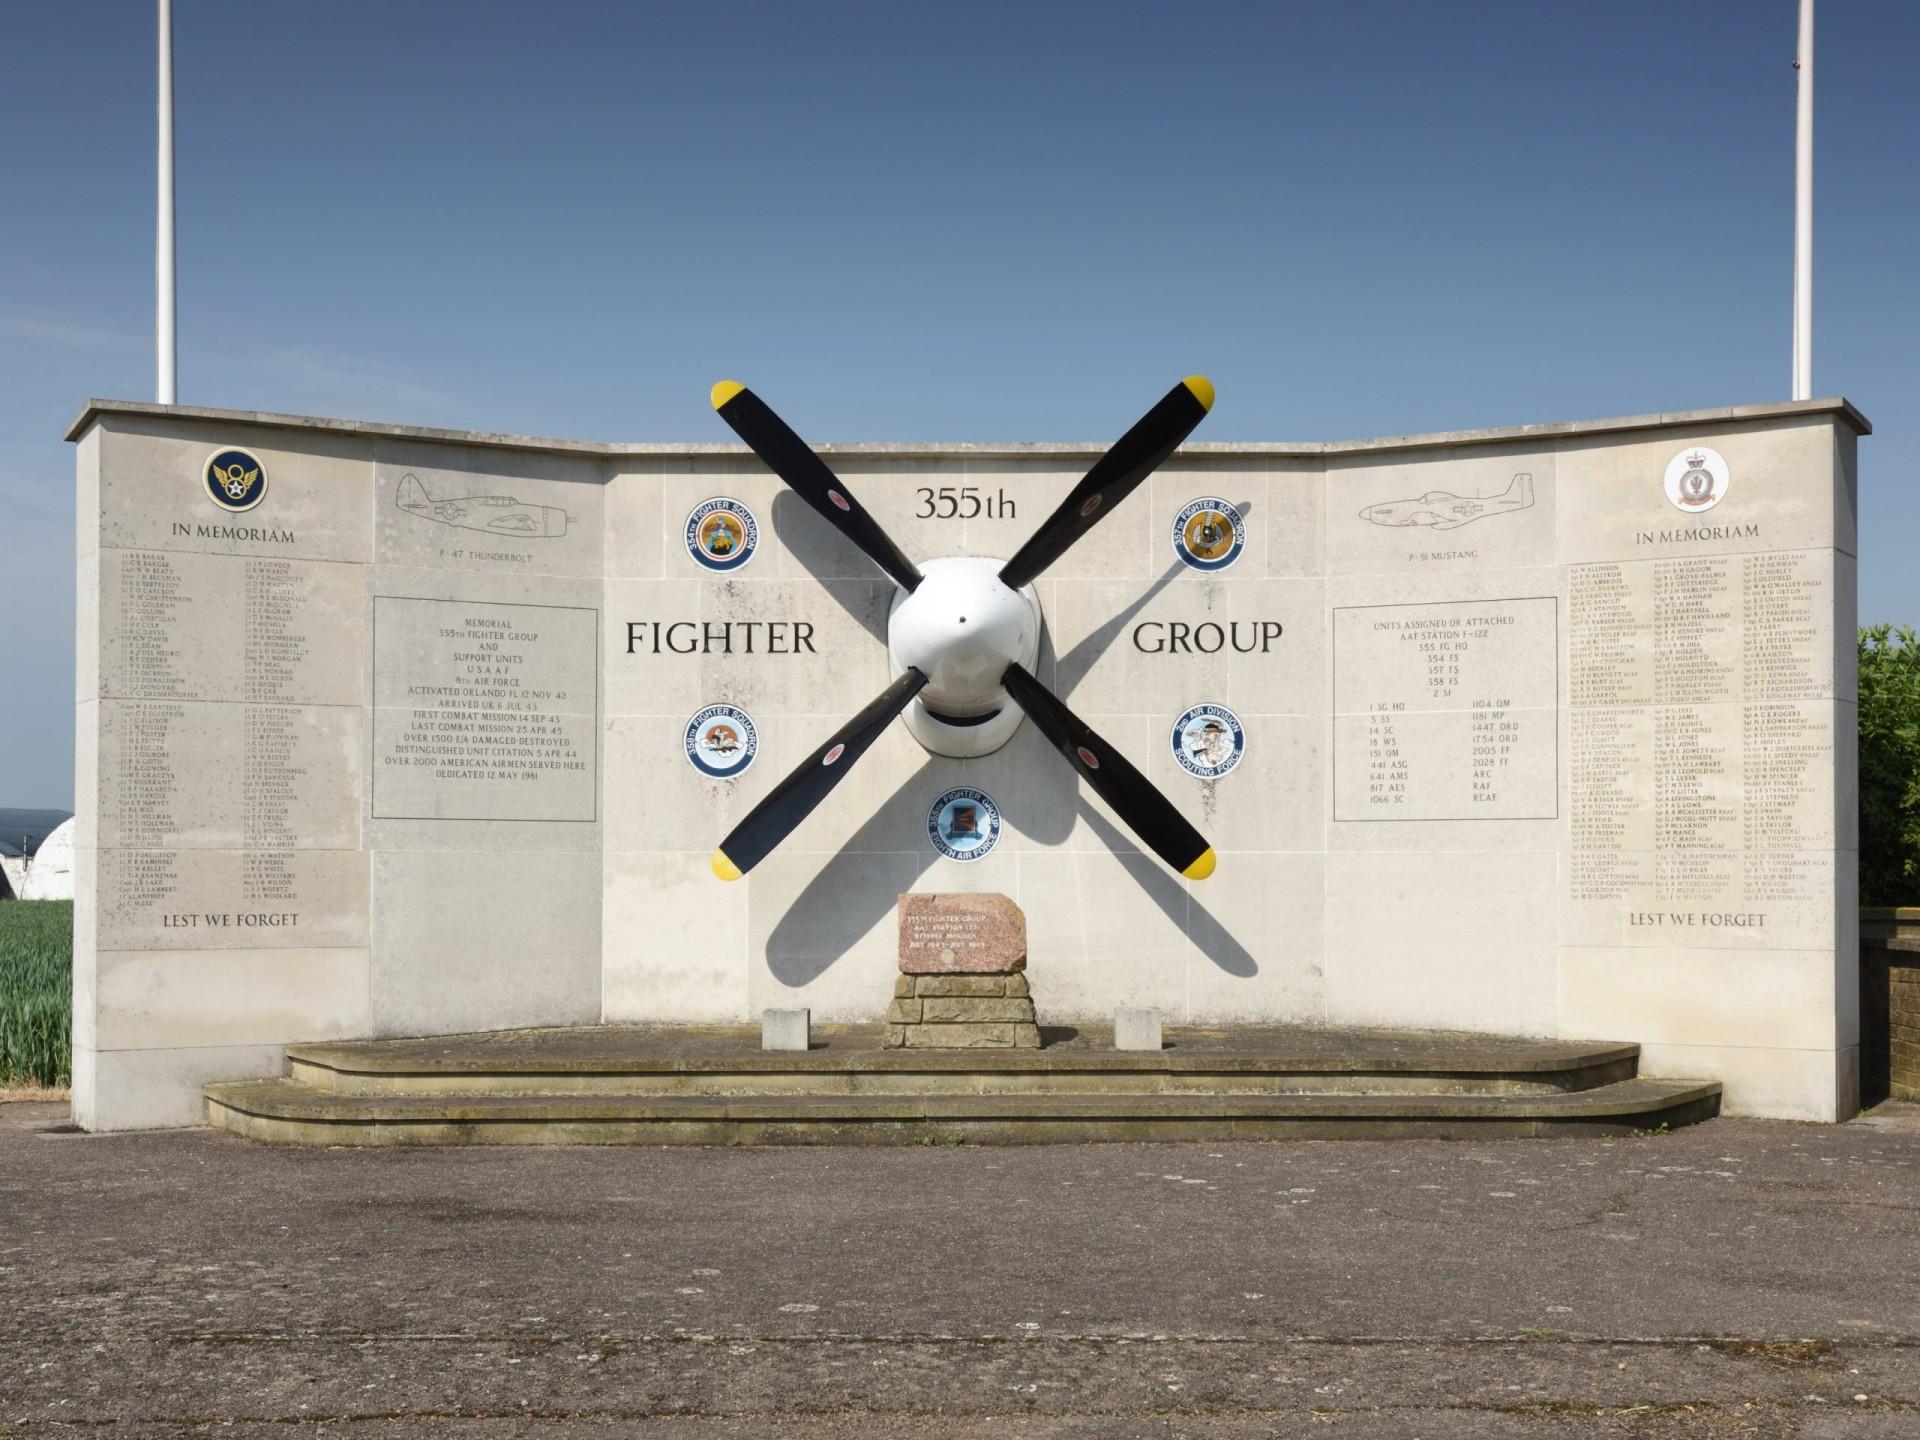 Steeple Morden Airfield memorial